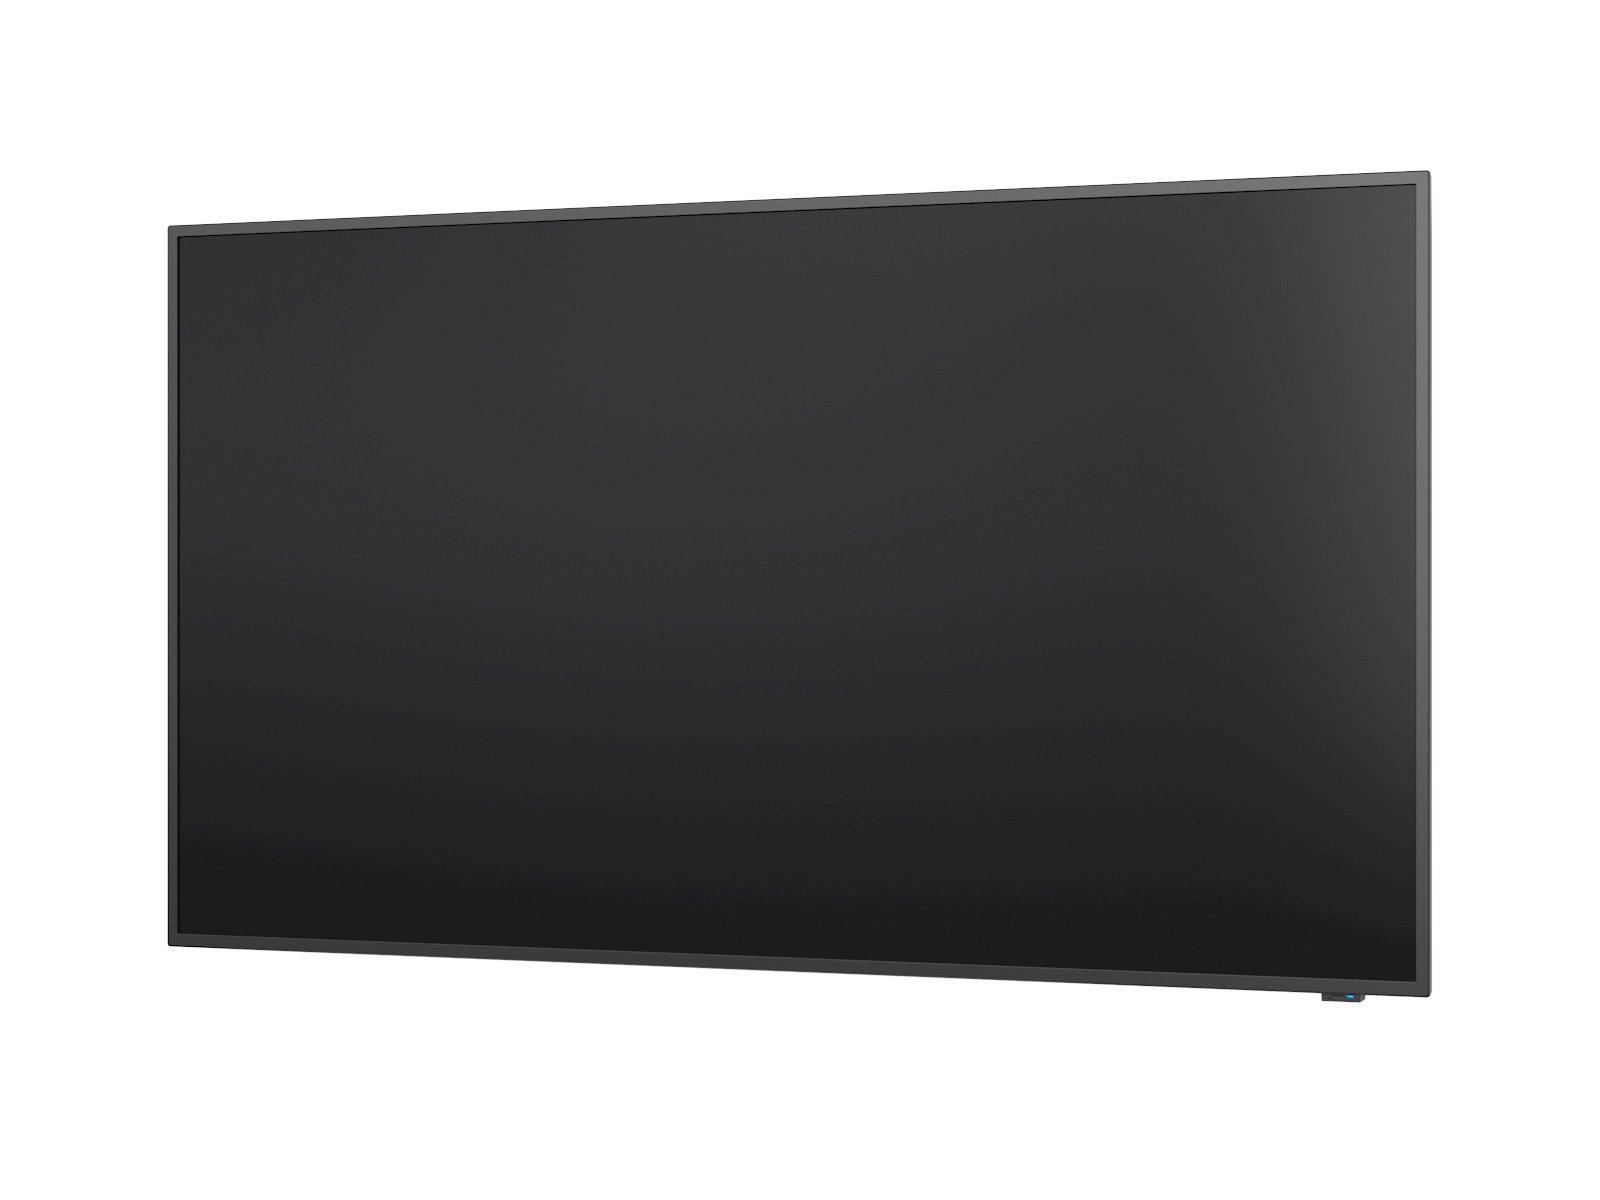 "Широкоформатен дисплей NEC MultiSync E438, 43"", UHD, 350cd/m2, Direct LED backlight, 16/7 proof, Media Player-3"